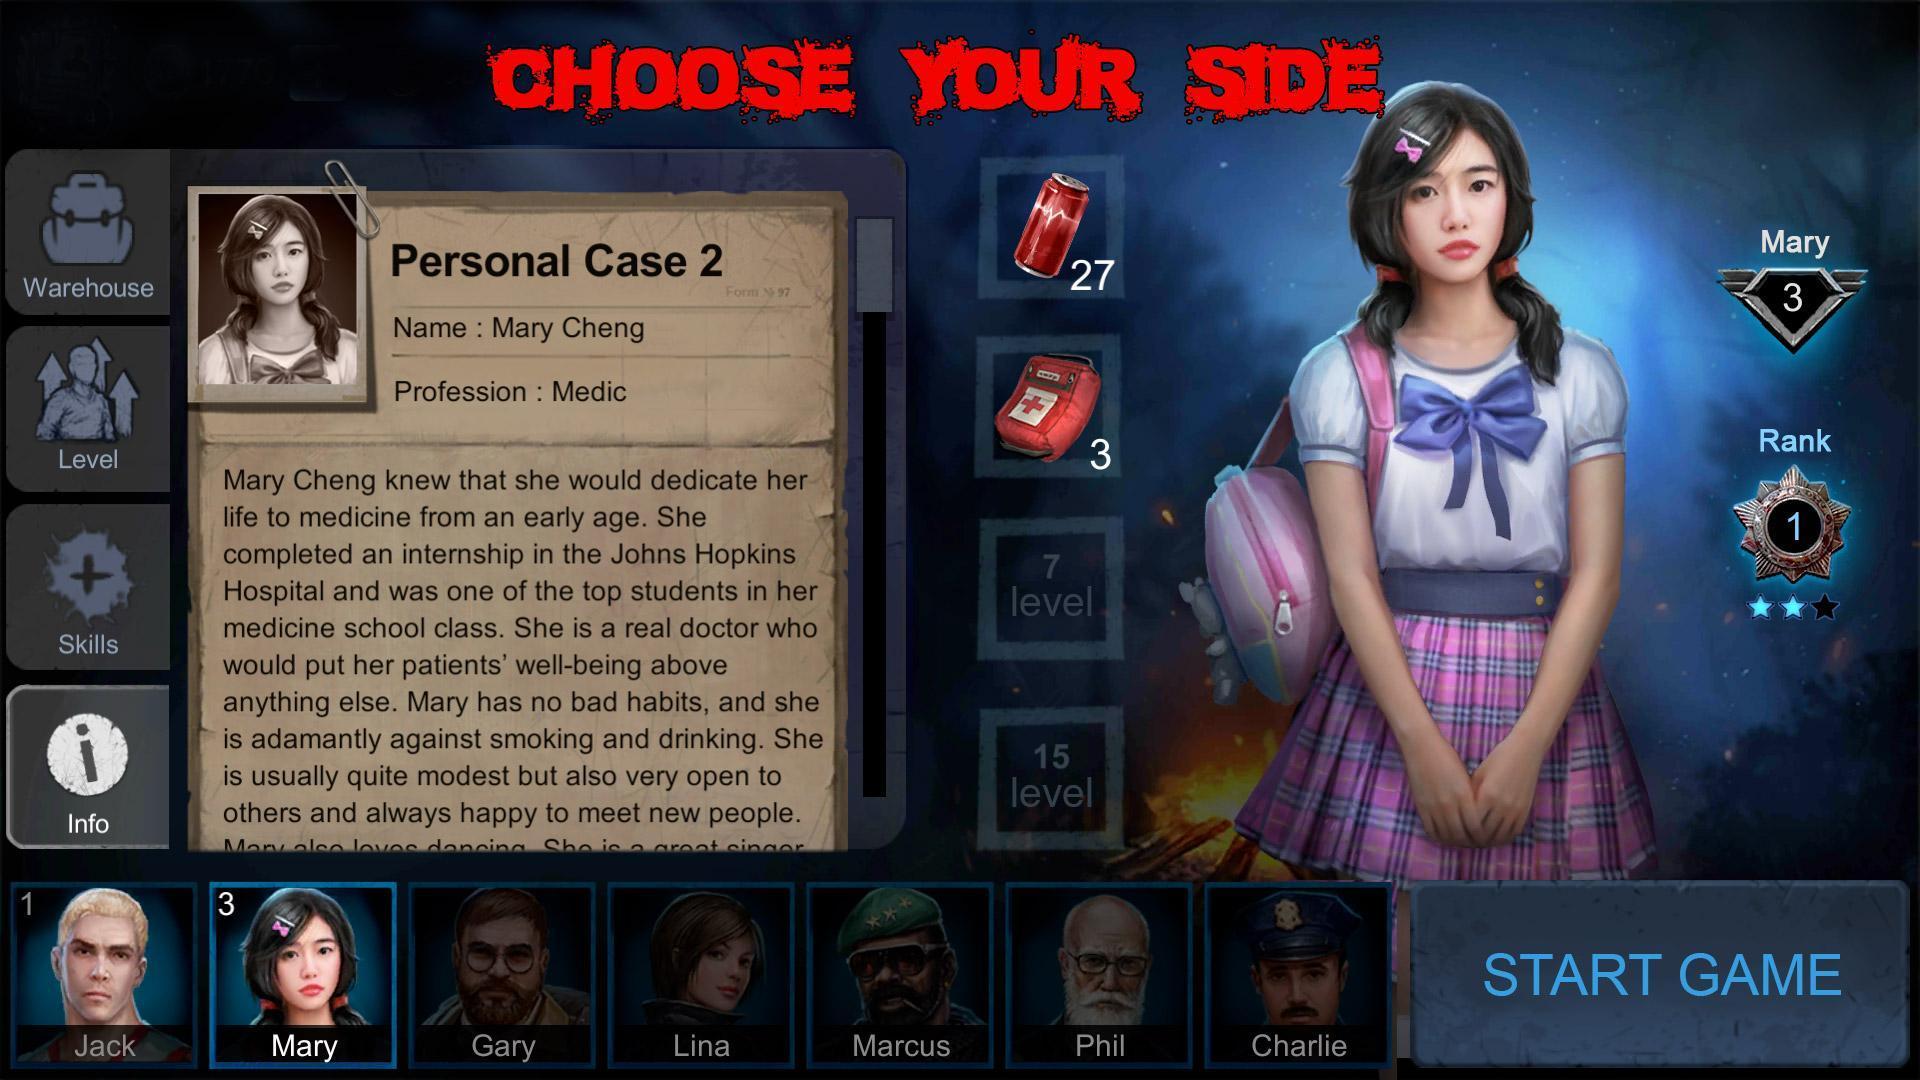 Horrorfield Multiplayer Survival Horror Game 1.3.6 Screenshot 6